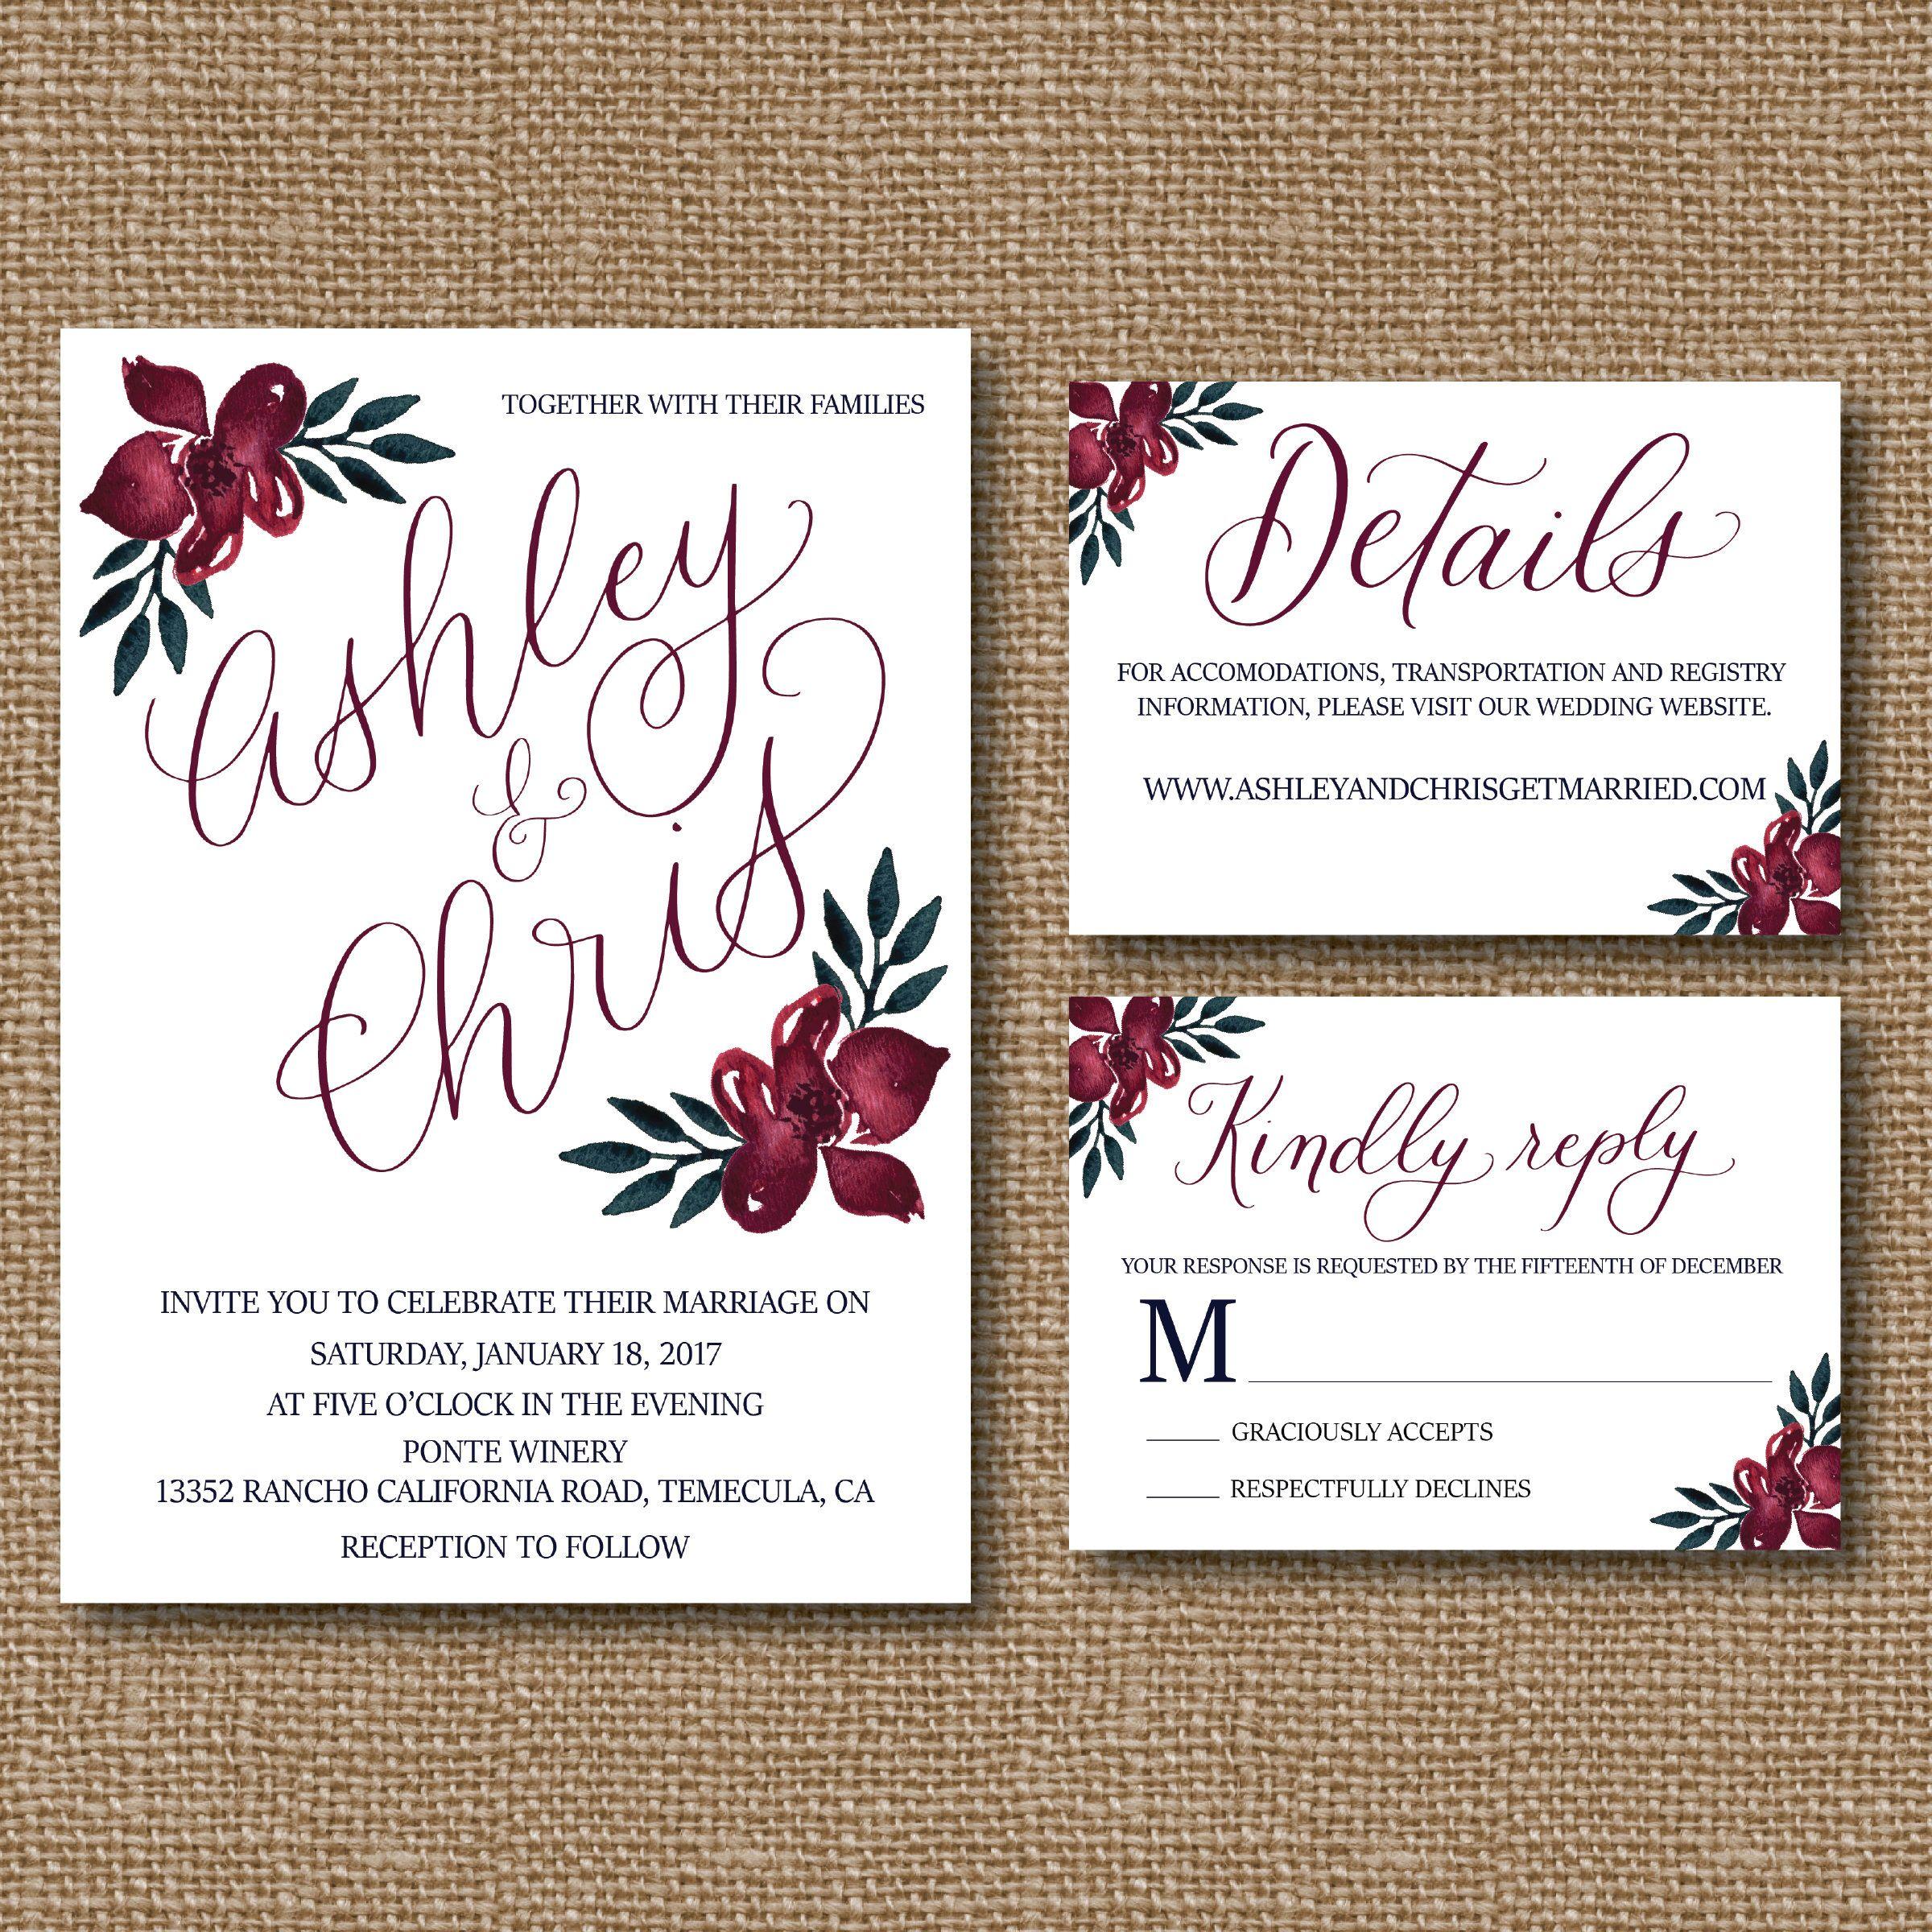 Merlot and Navy Floral Wedding Invitation Template - Invitation ...